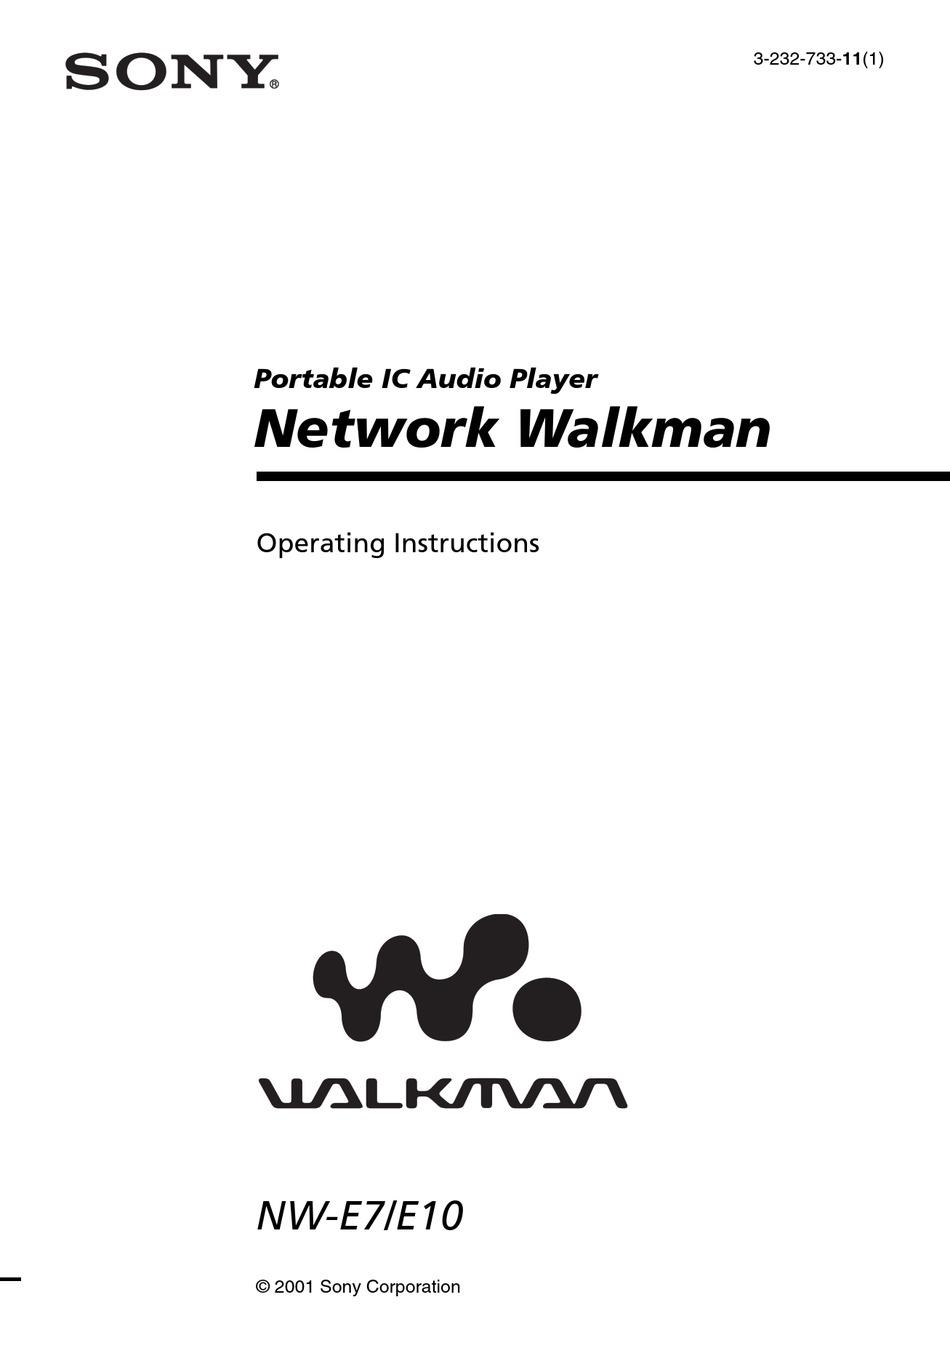 SONY WALKMAN NW-E7 OPERATING INSTRUCTIONS MANUAL Pdf